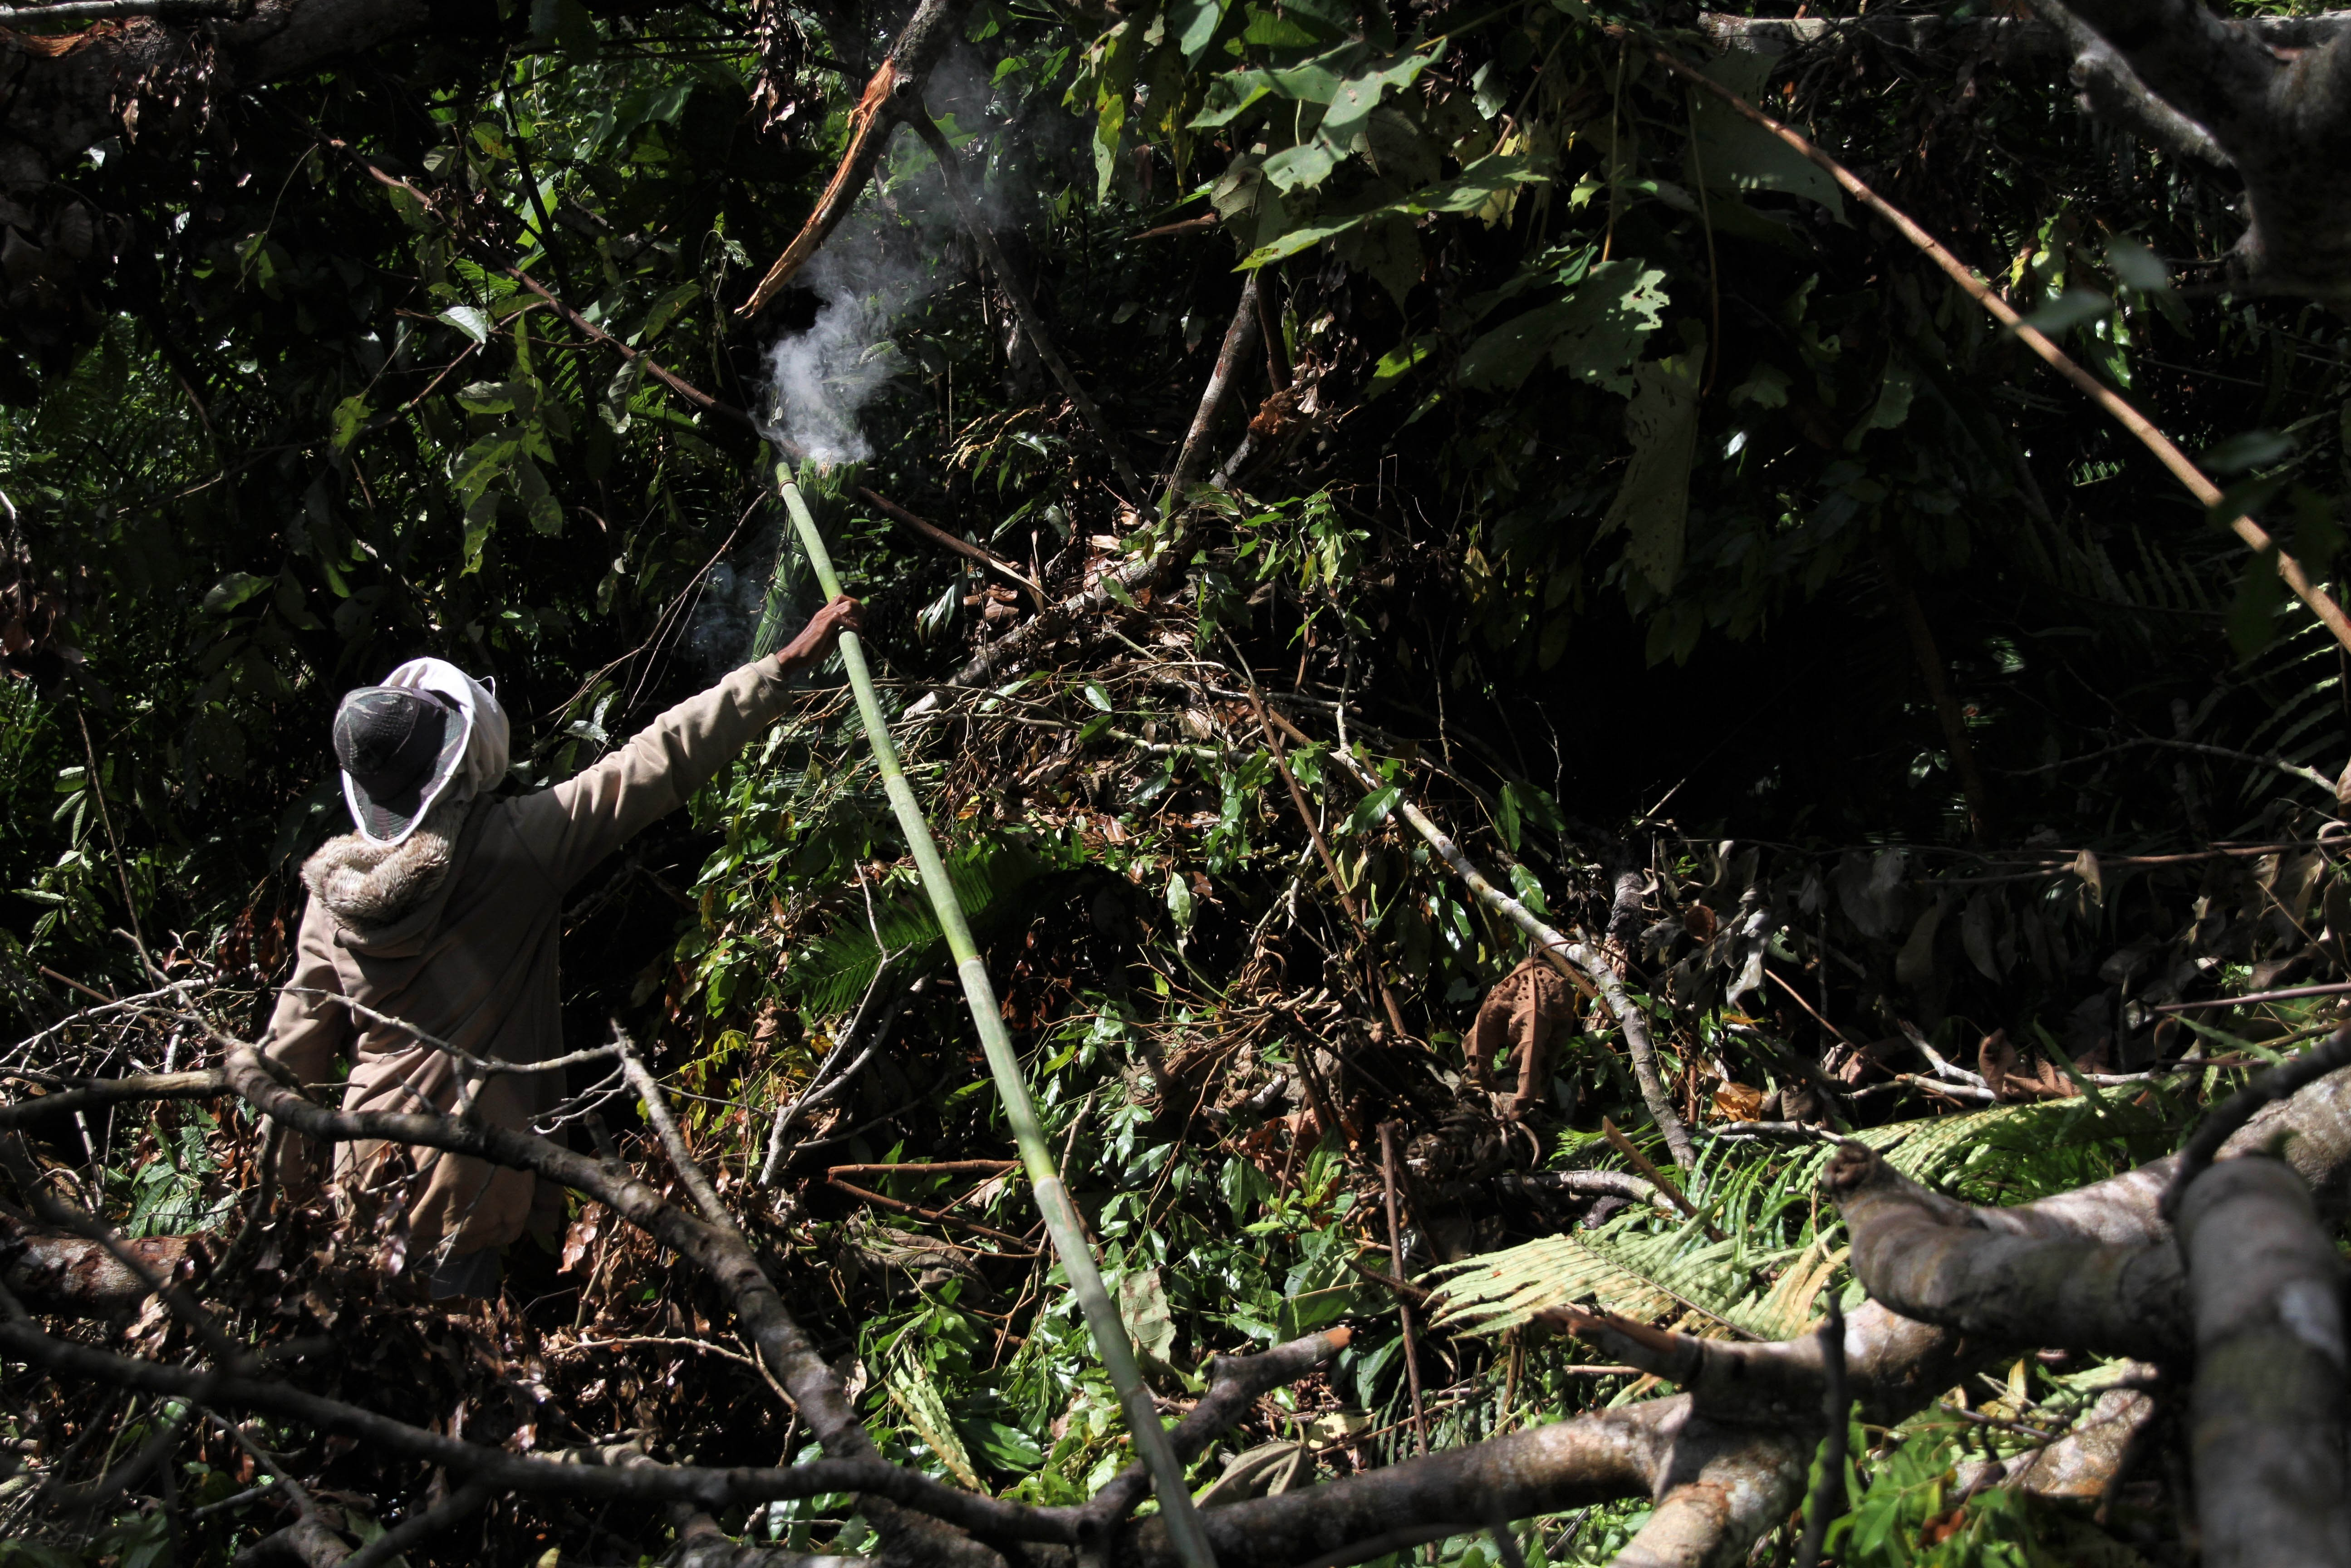 \r\nTriono mengasapi daerah sekitar sarang lebah madu gong di kawasan Gunung Landono di Desa Landono 2, Kecamatan Landono, Konawe Selatan, Sulawesi Tenggara.